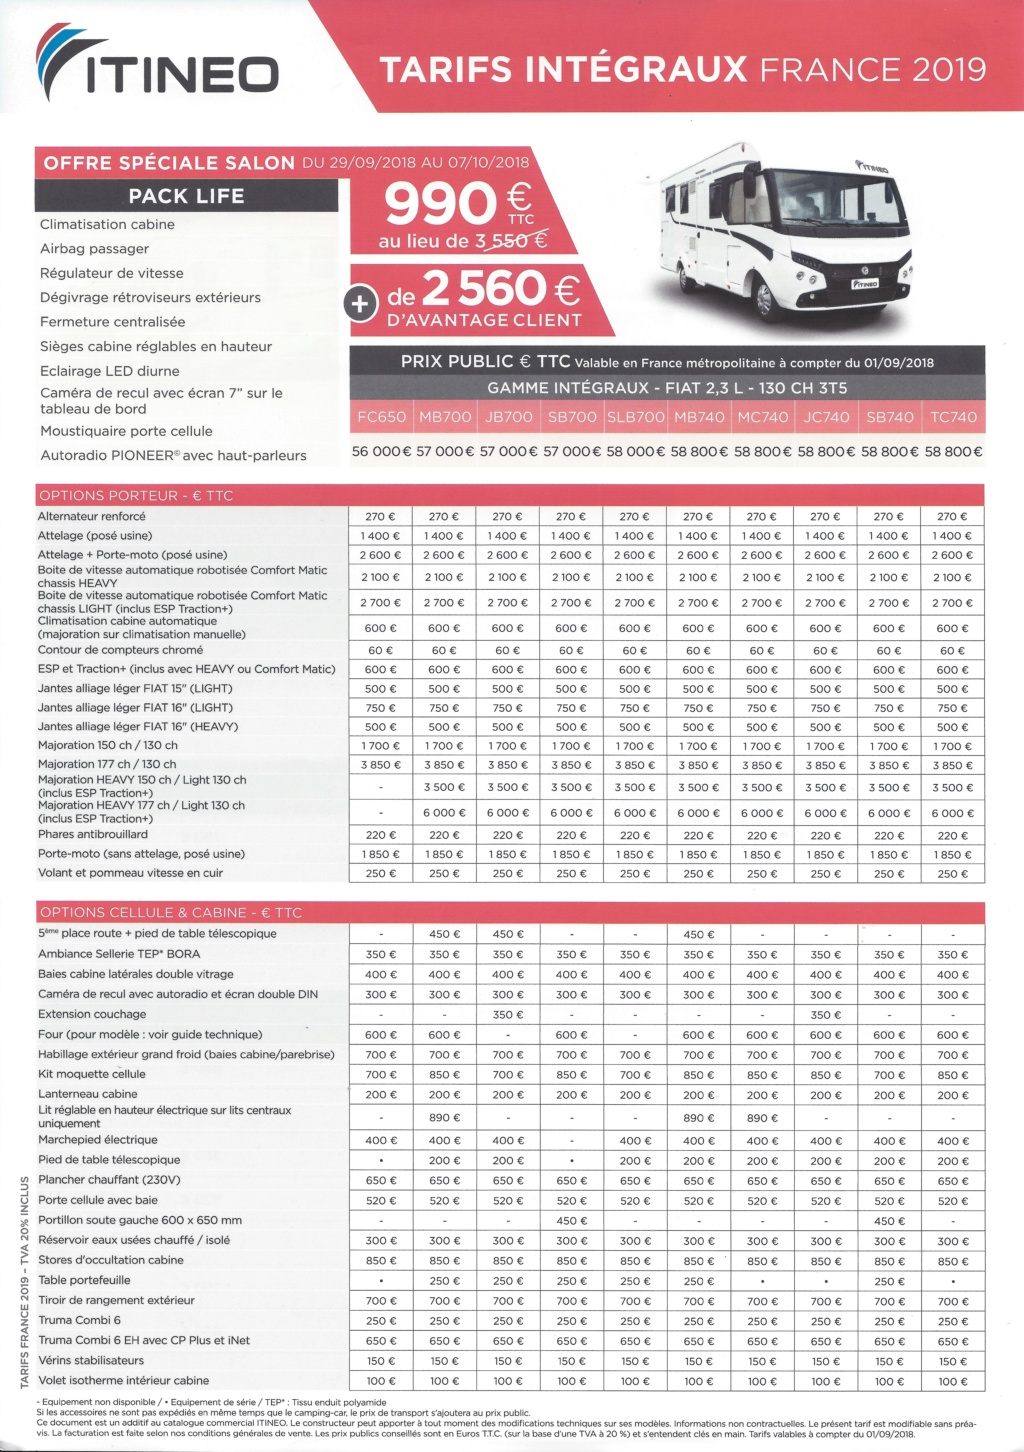 Tarif intégraux France 2019 (véhicules et accessoires) Tariti12